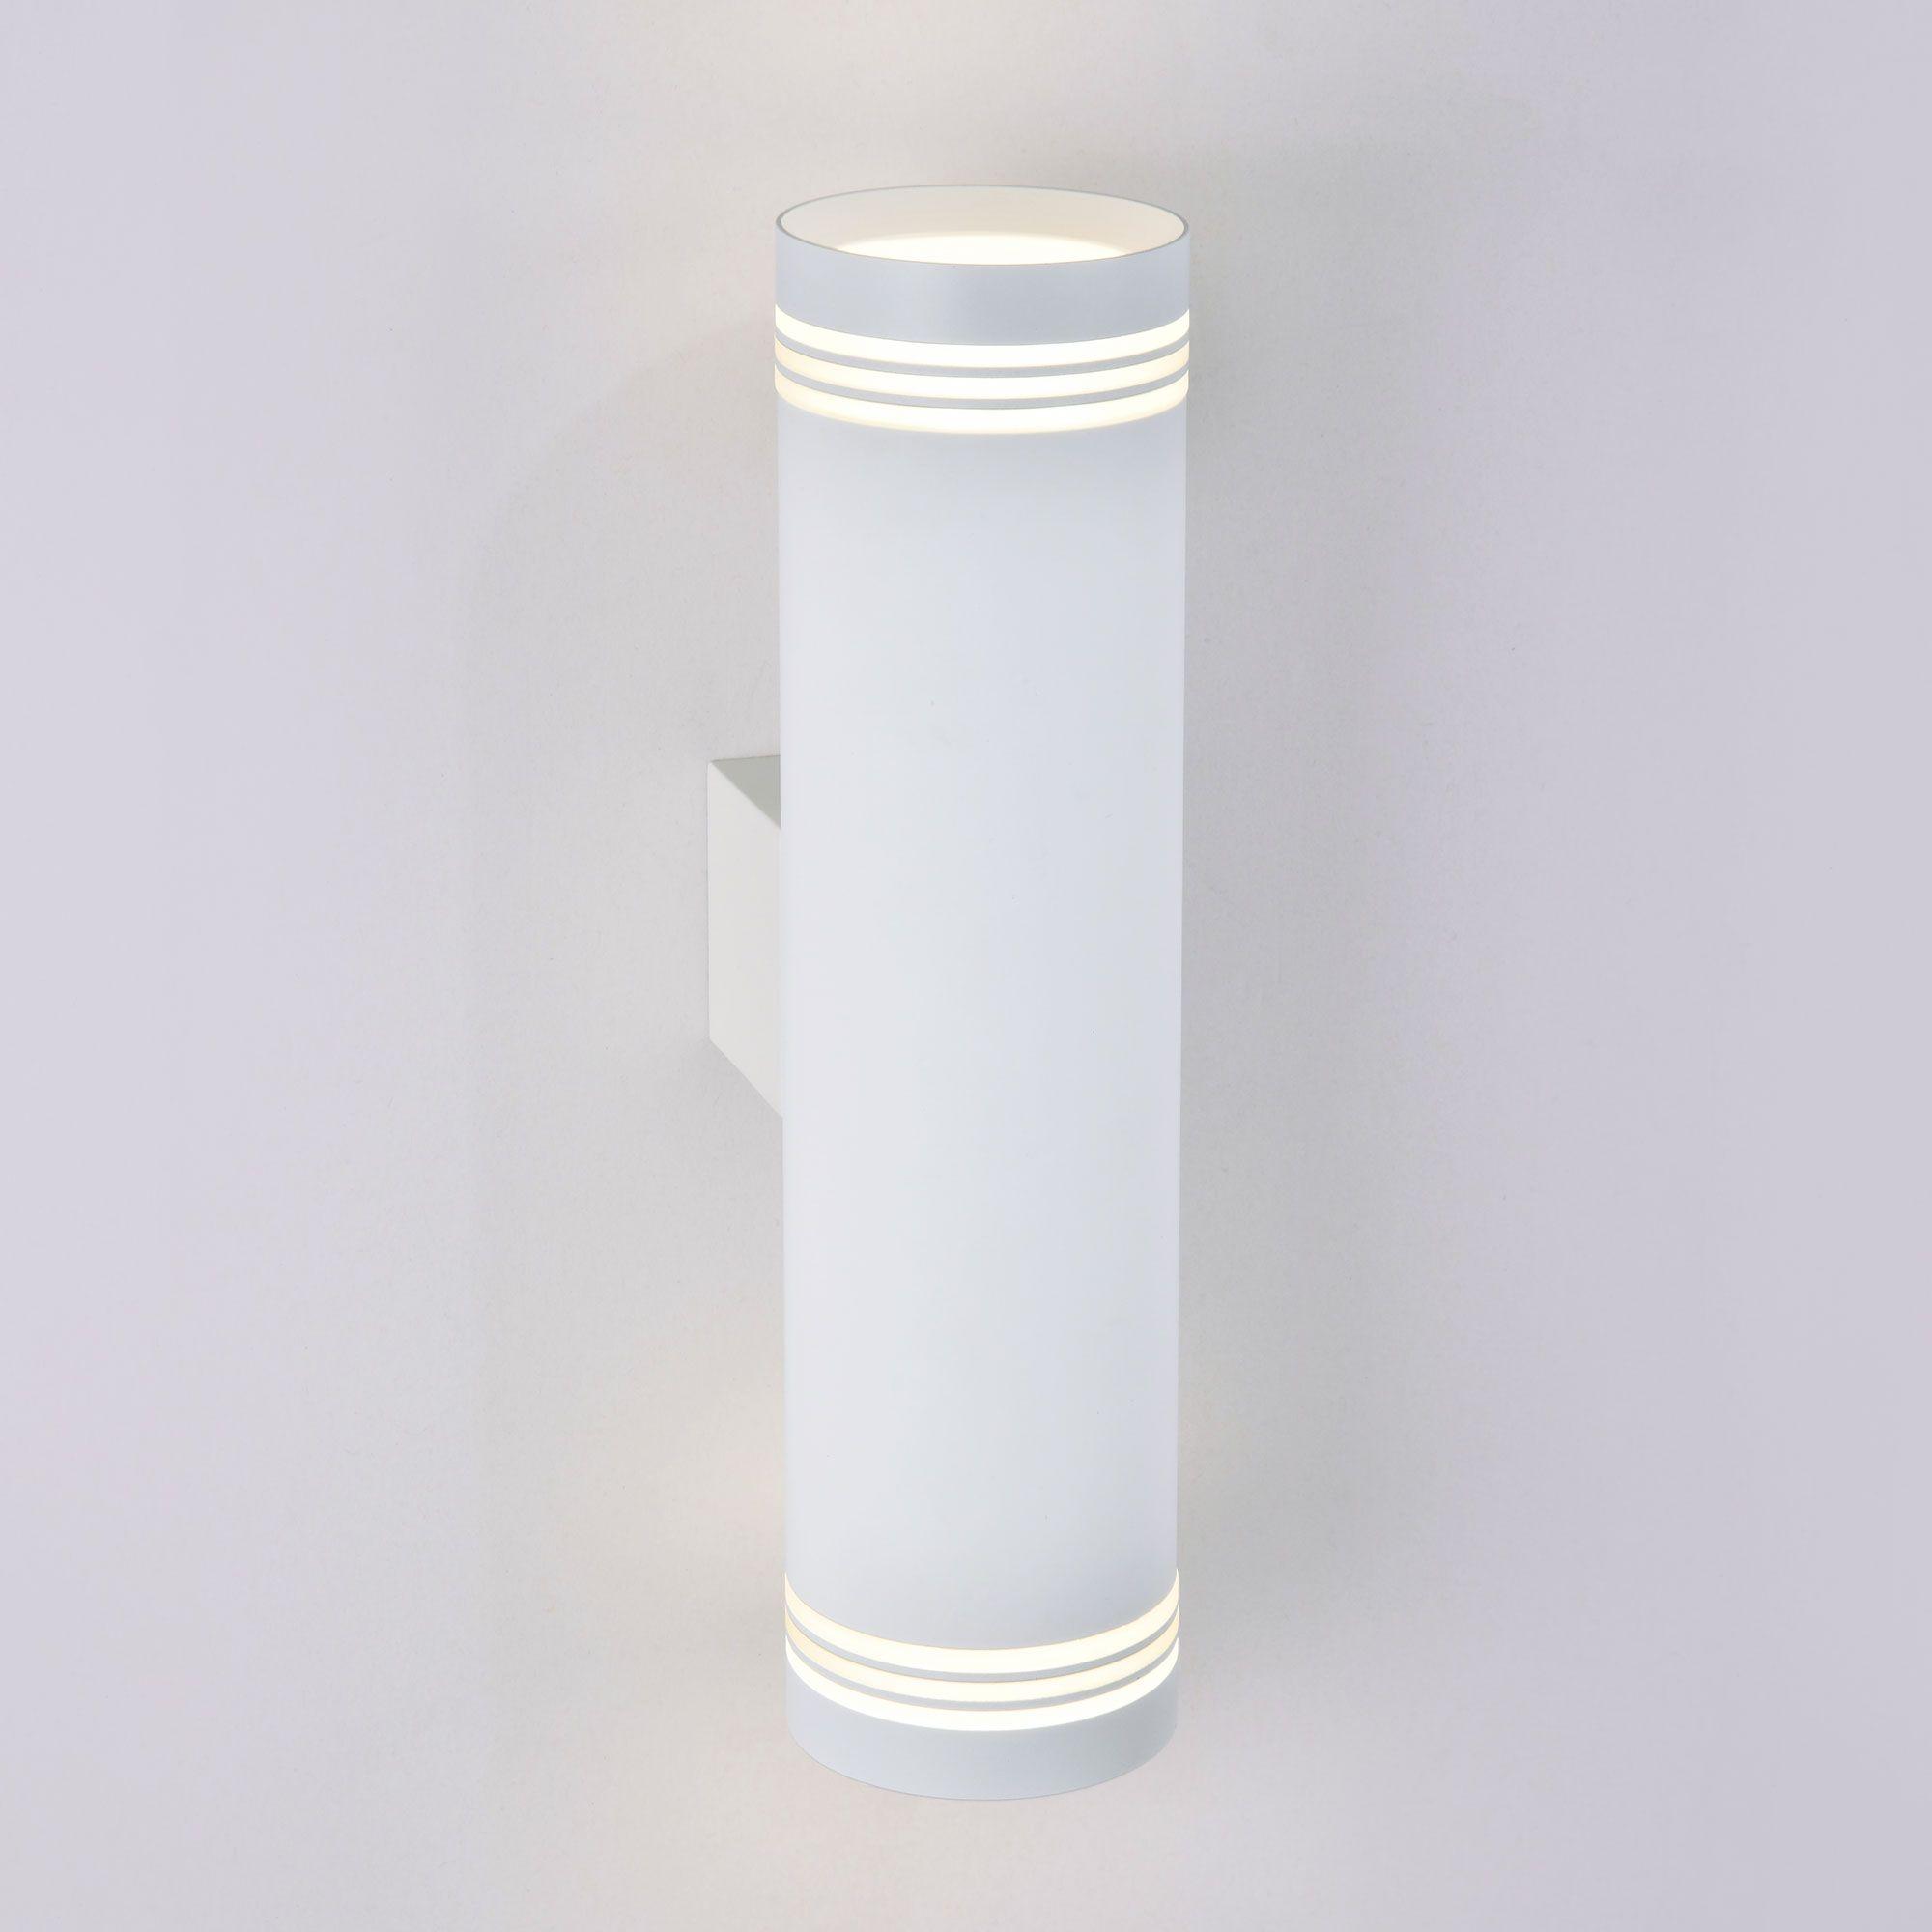 Настенный светодиодный светильник Selin LED MRL LED 1004 белый